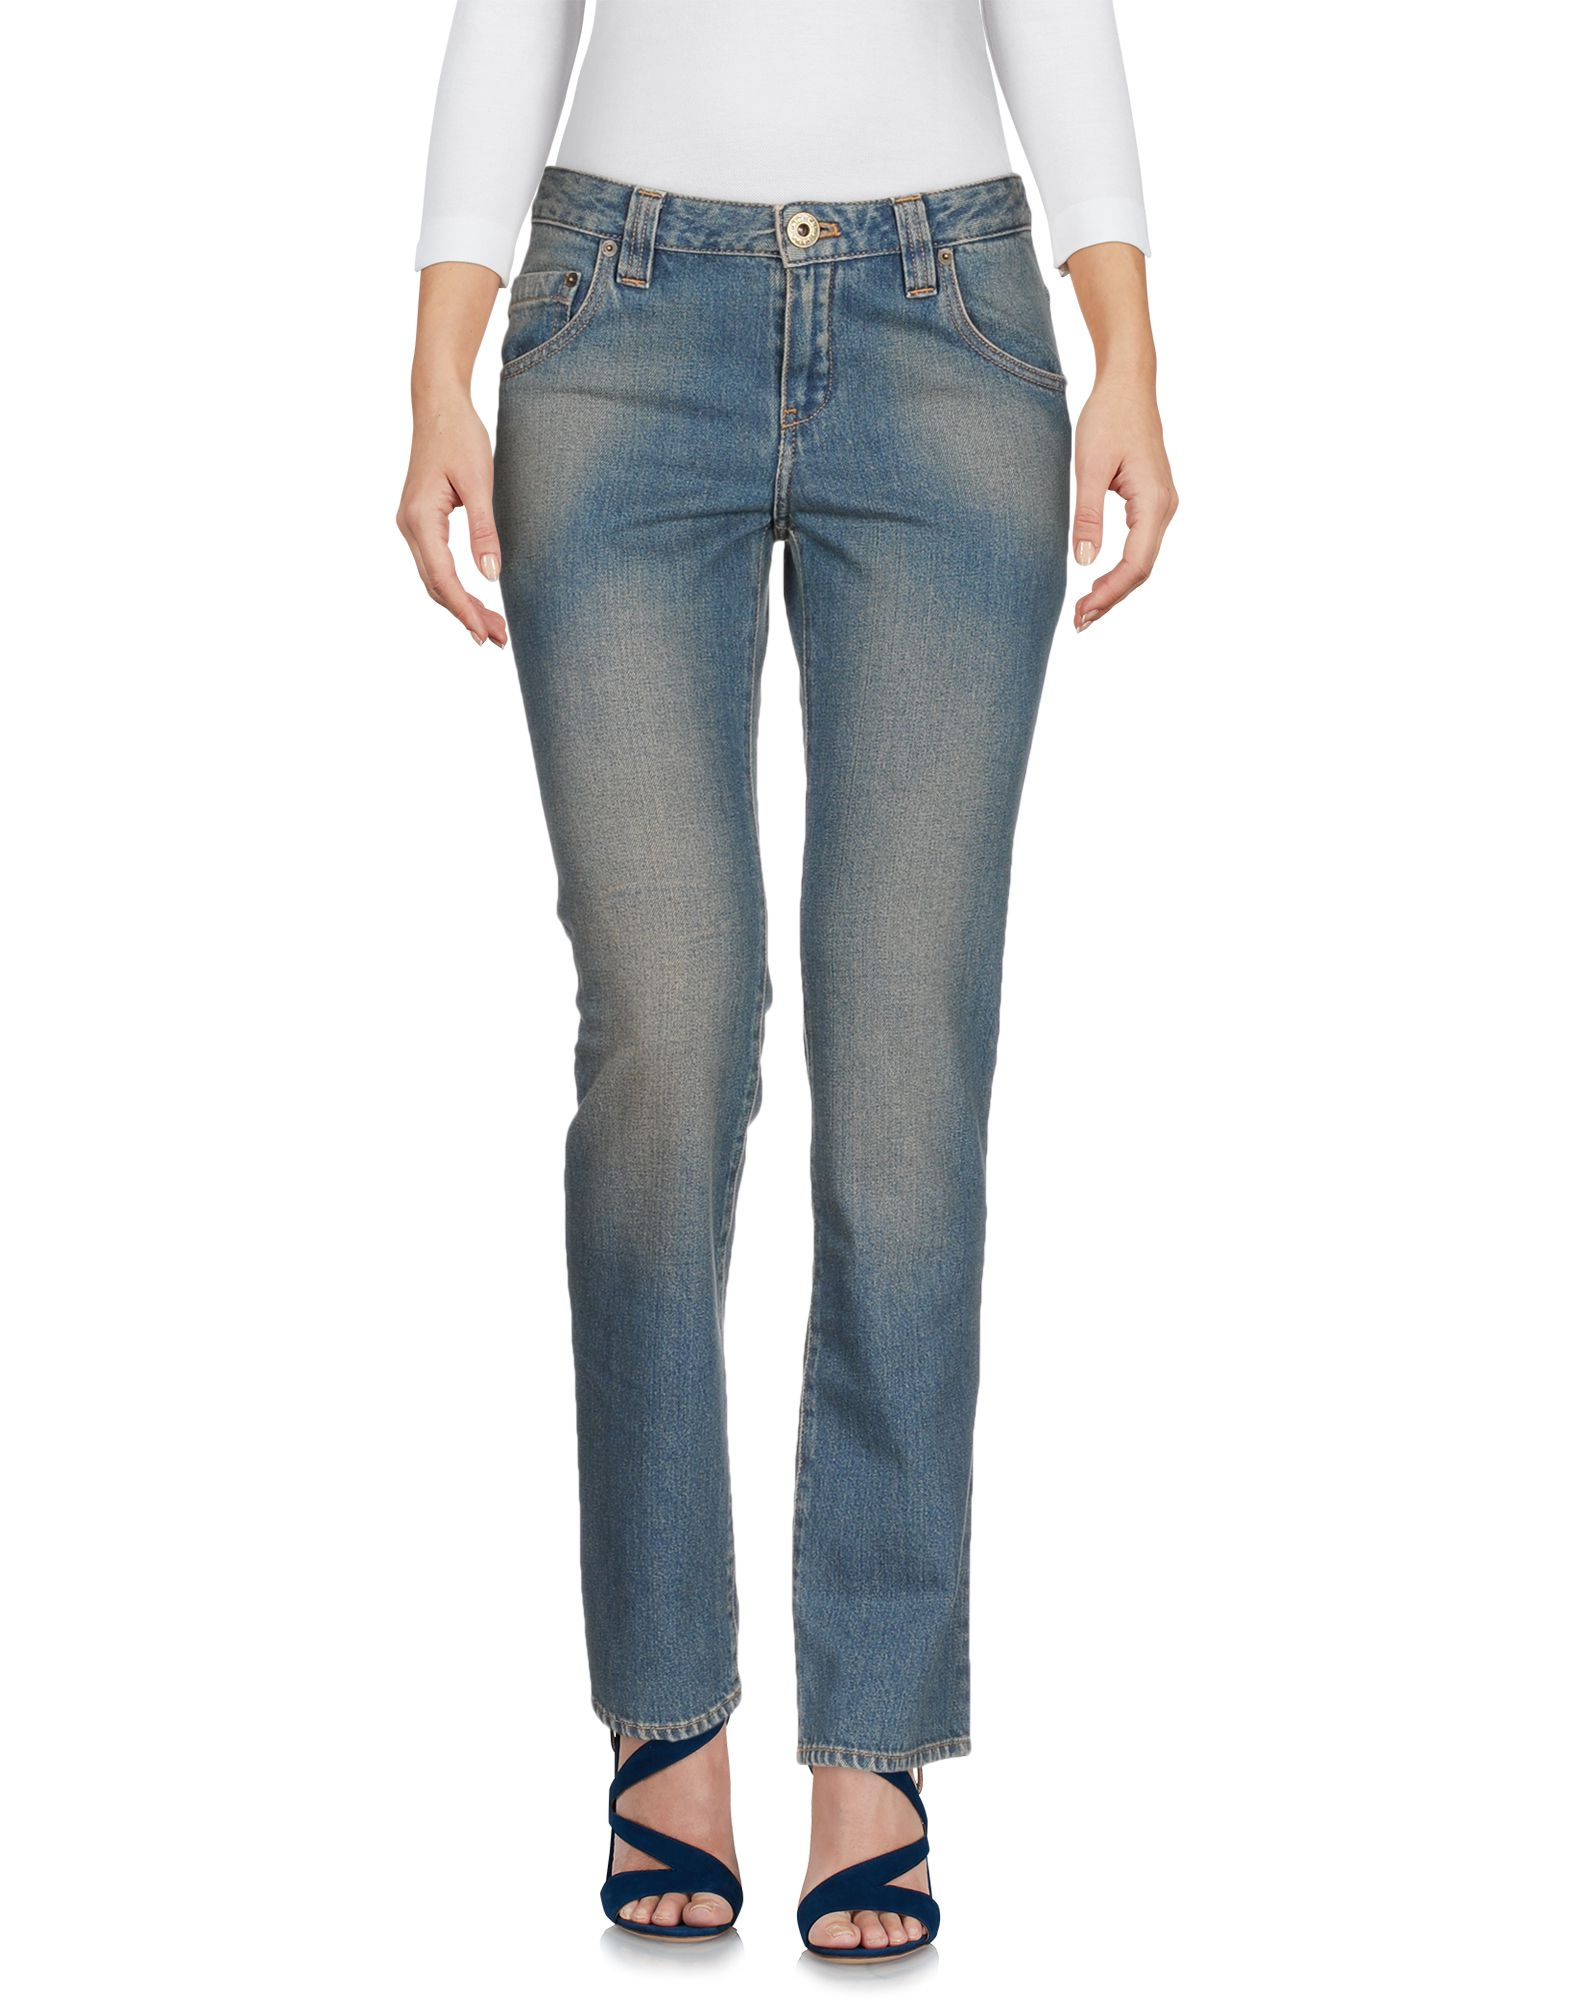 Pantaloni Jeans Chloé Donna - Acquista online su 3pDtxu